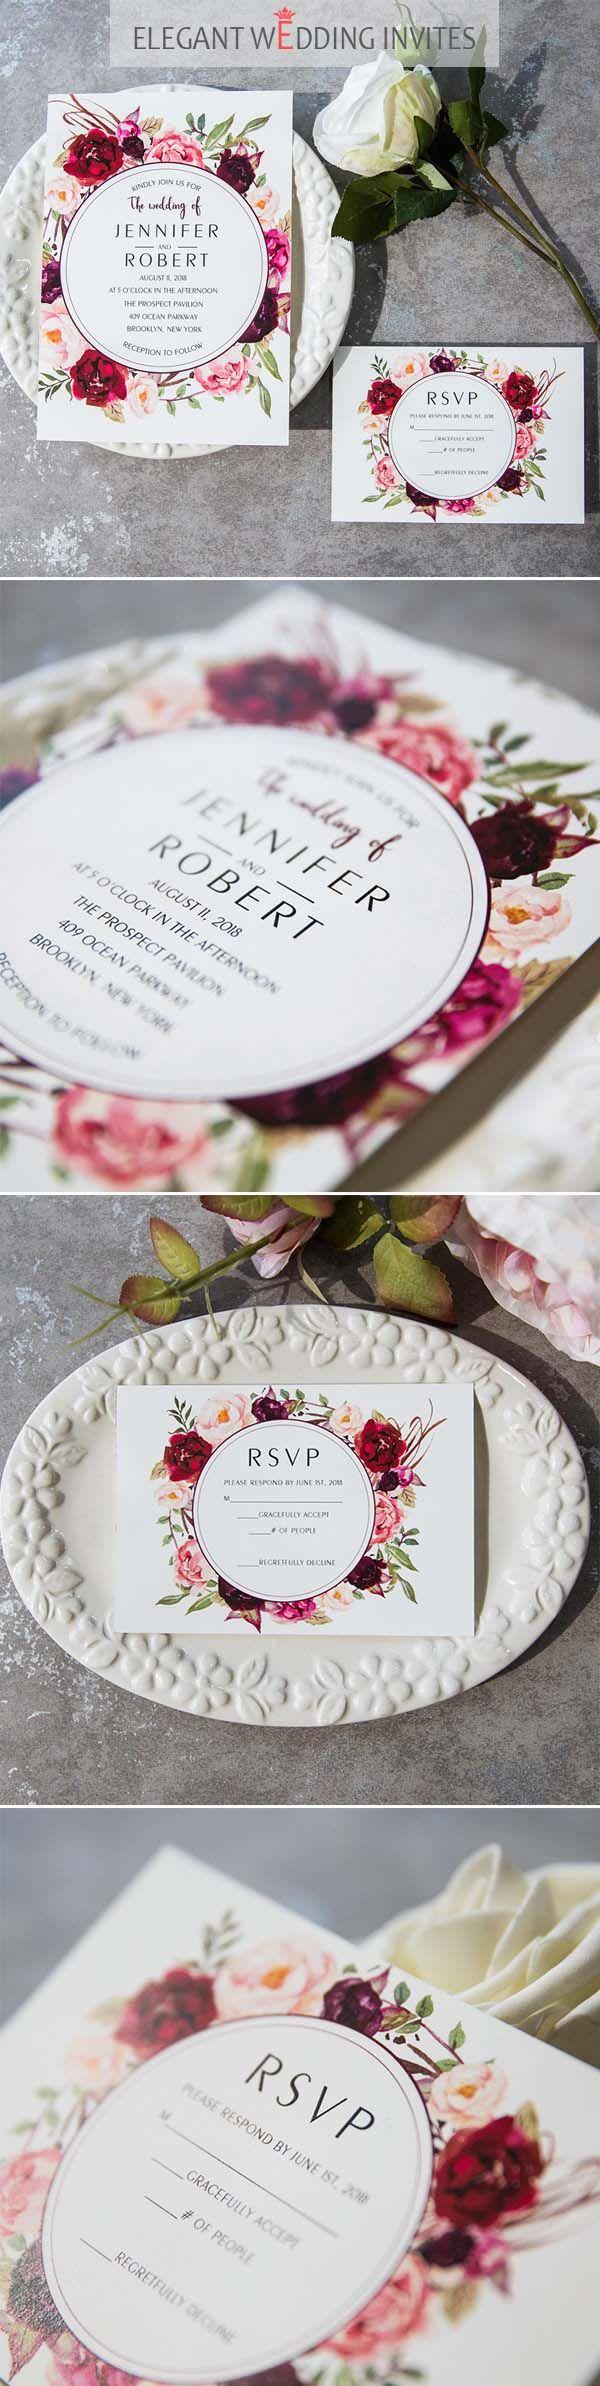 64 best wedding images on Pinterest   Weddings, Beach weddings and ...